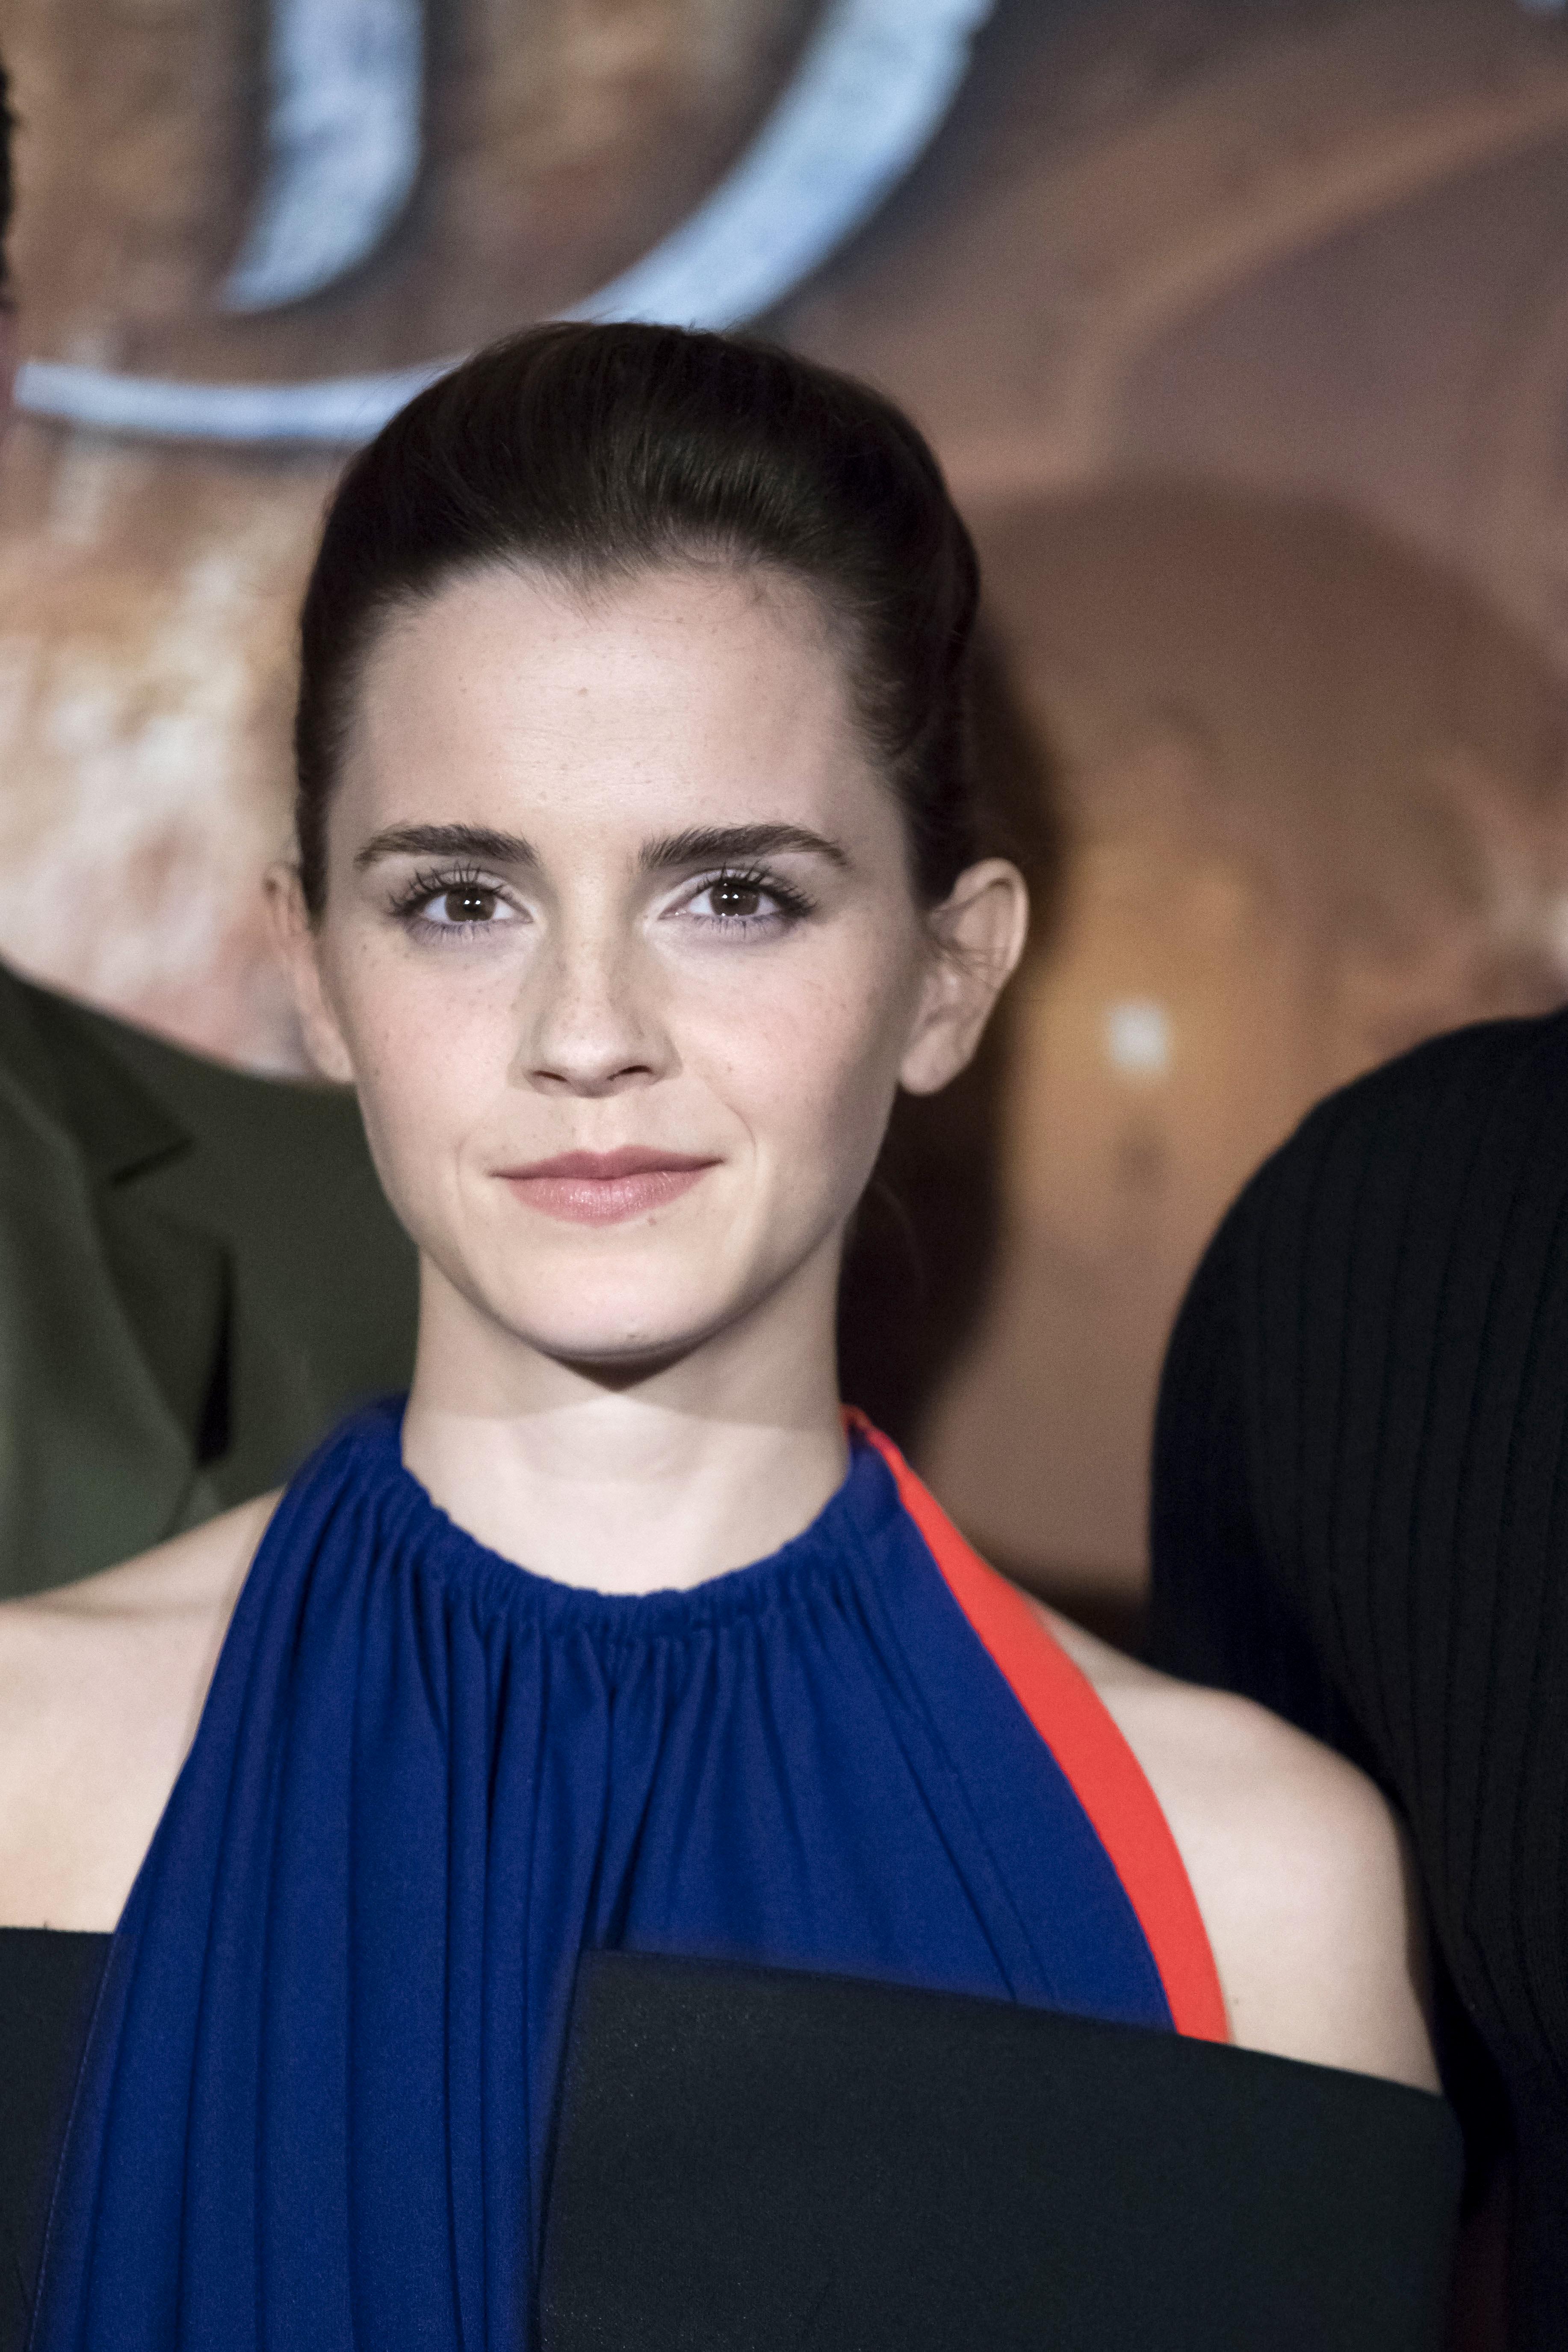 Emma Watson – I Love Her Freckles